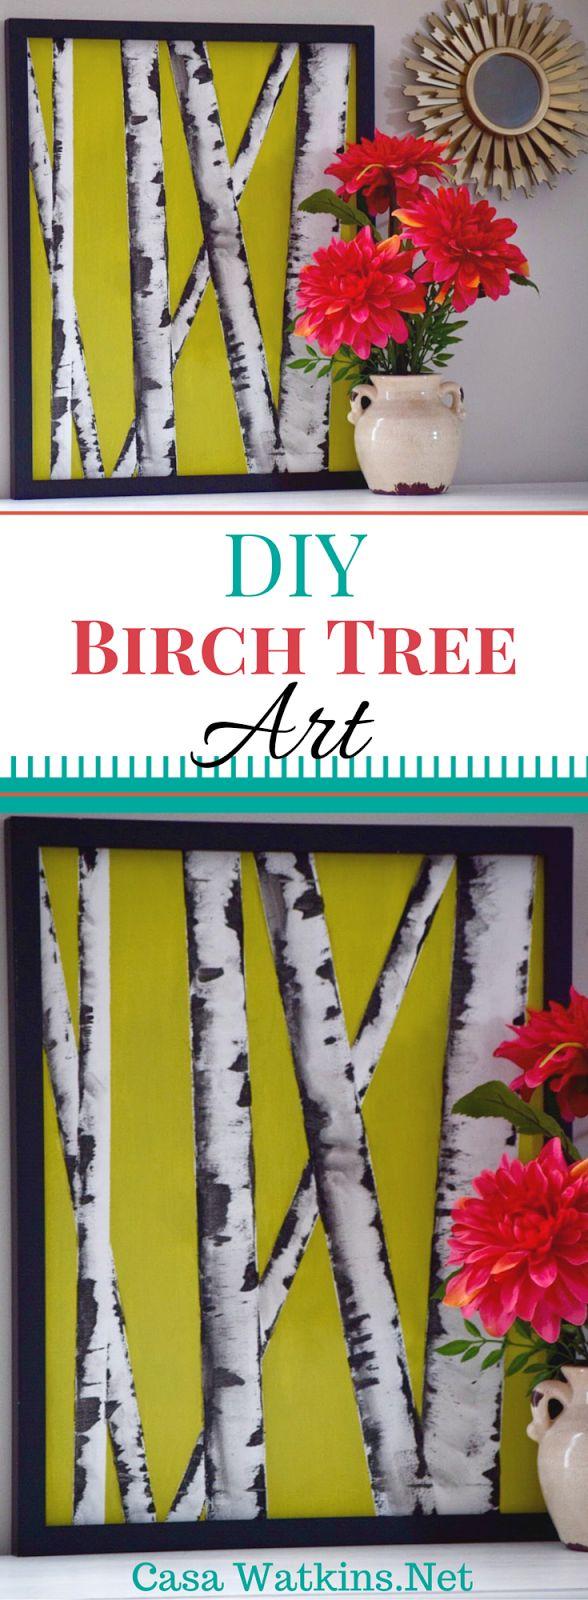 best 20 birch tree mural ideas on pinterest birch tree art diy an easy to do diy birch tree art from casa watkins net